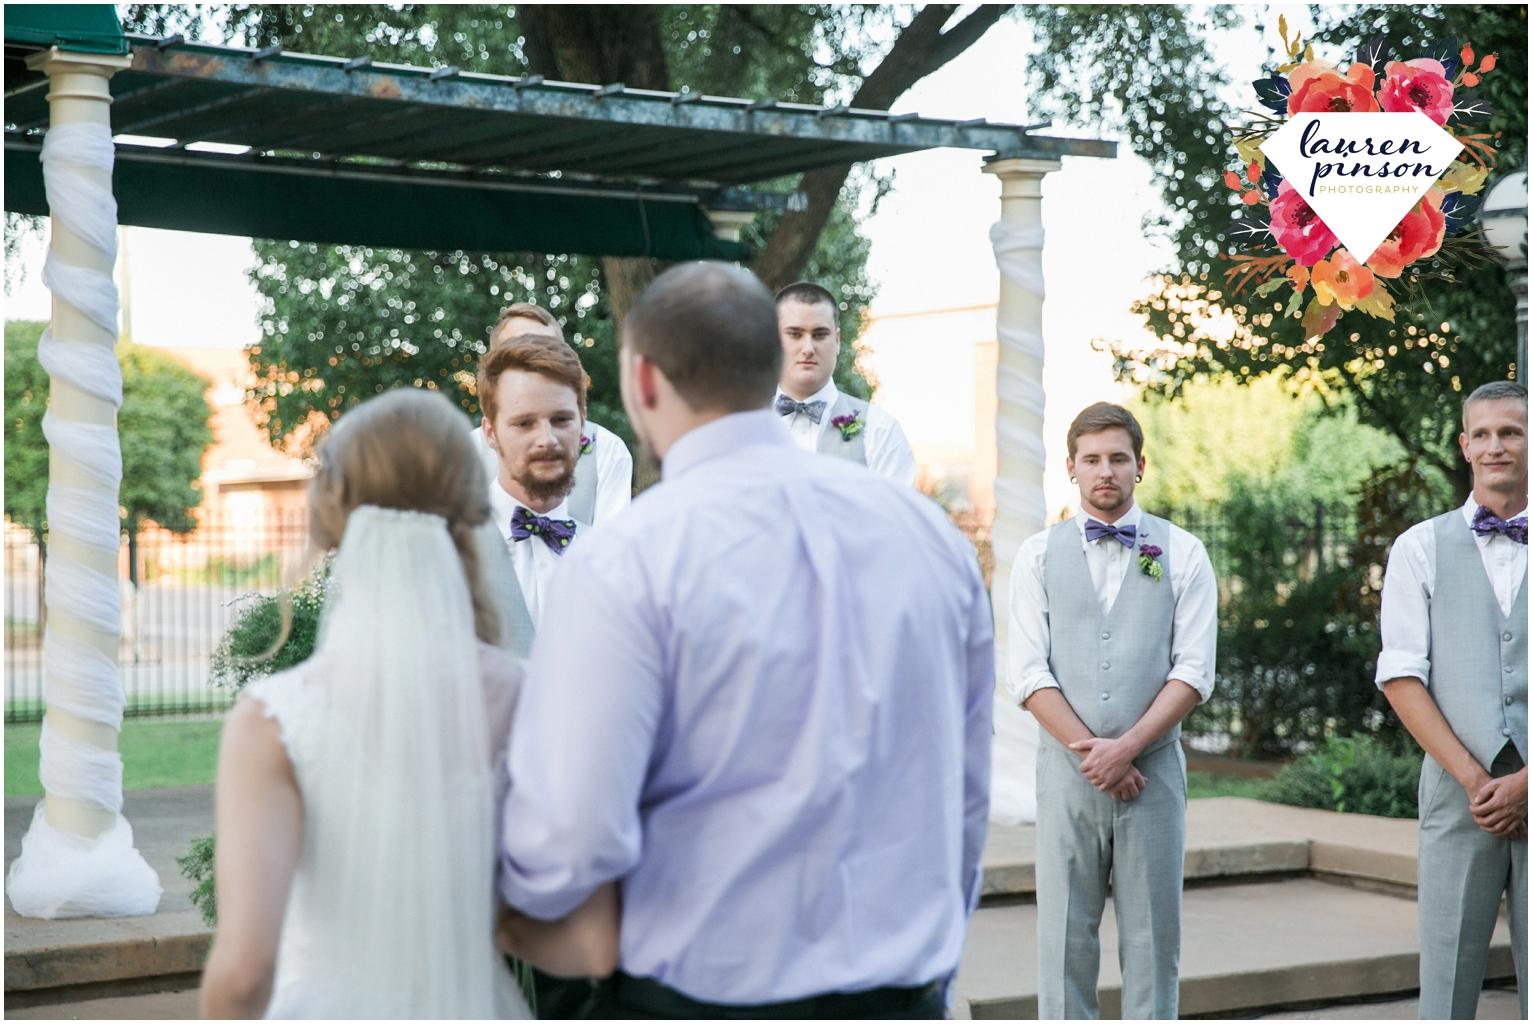 wichita-falls-wedding-photography-at-fain-presbyterian-church-and-the-wellington-timeless-classic-modern-photographer_1255.jpg